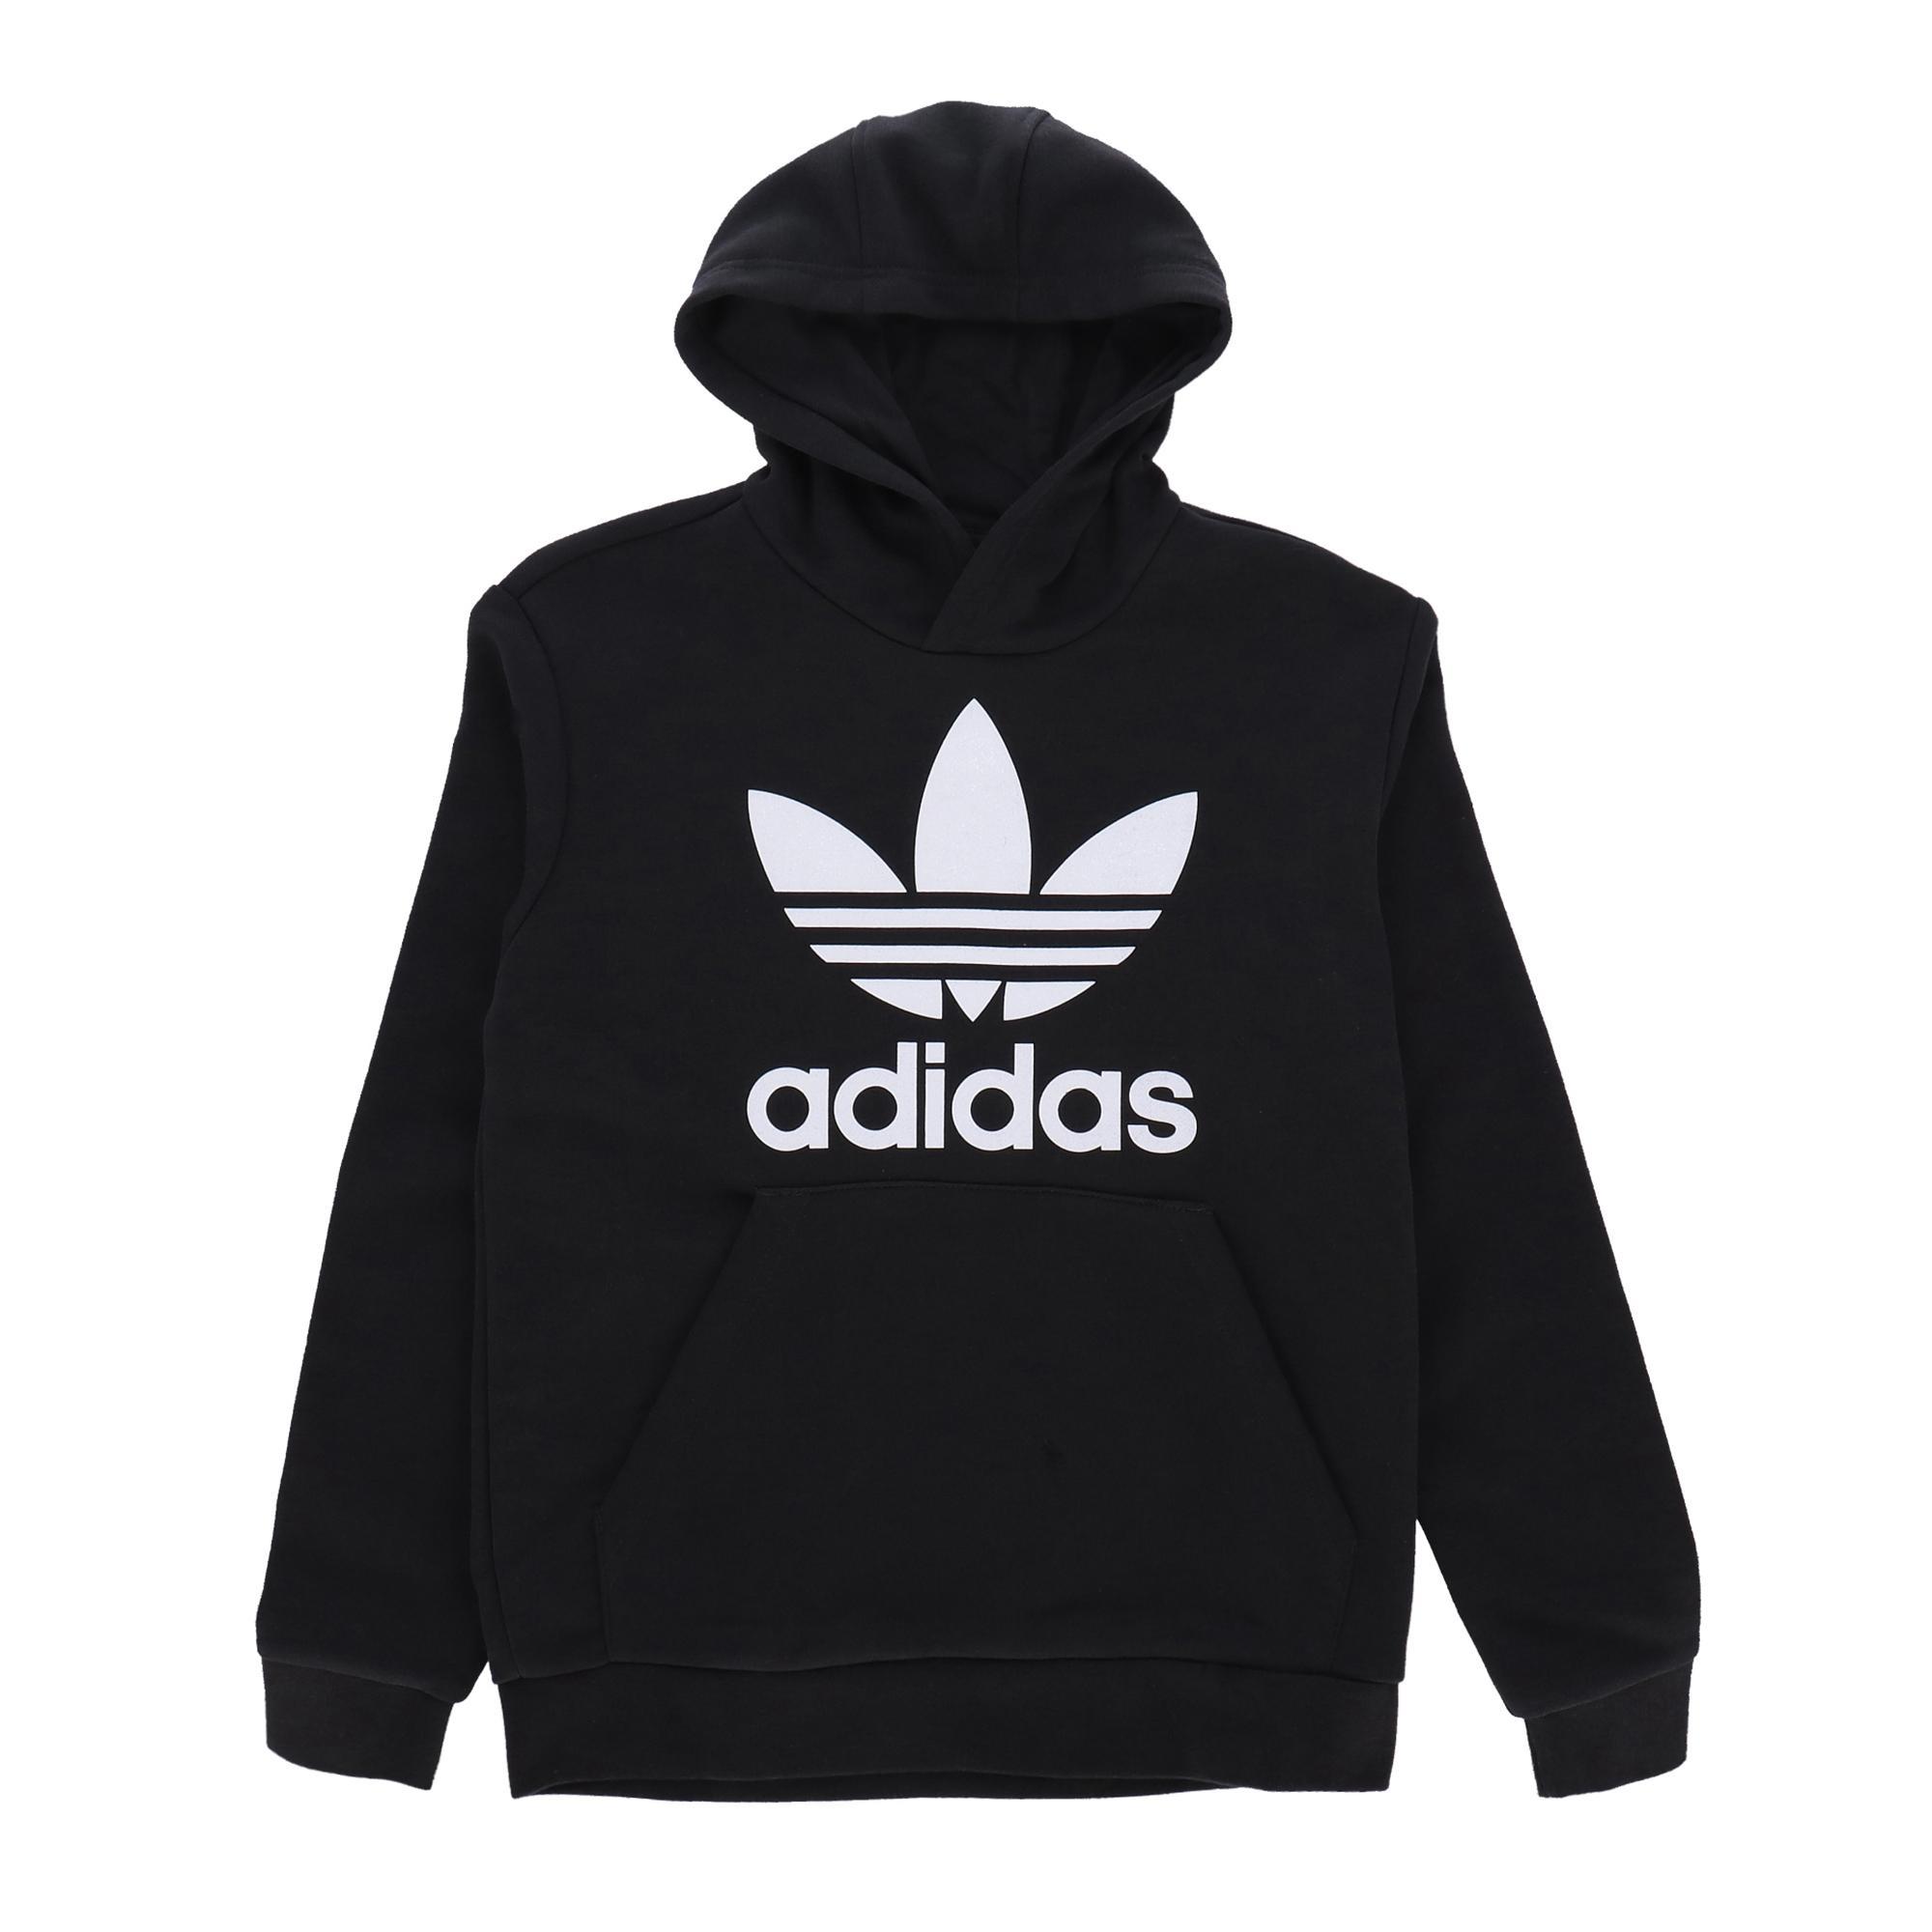 Adidas Trefoil Hoodie Black white